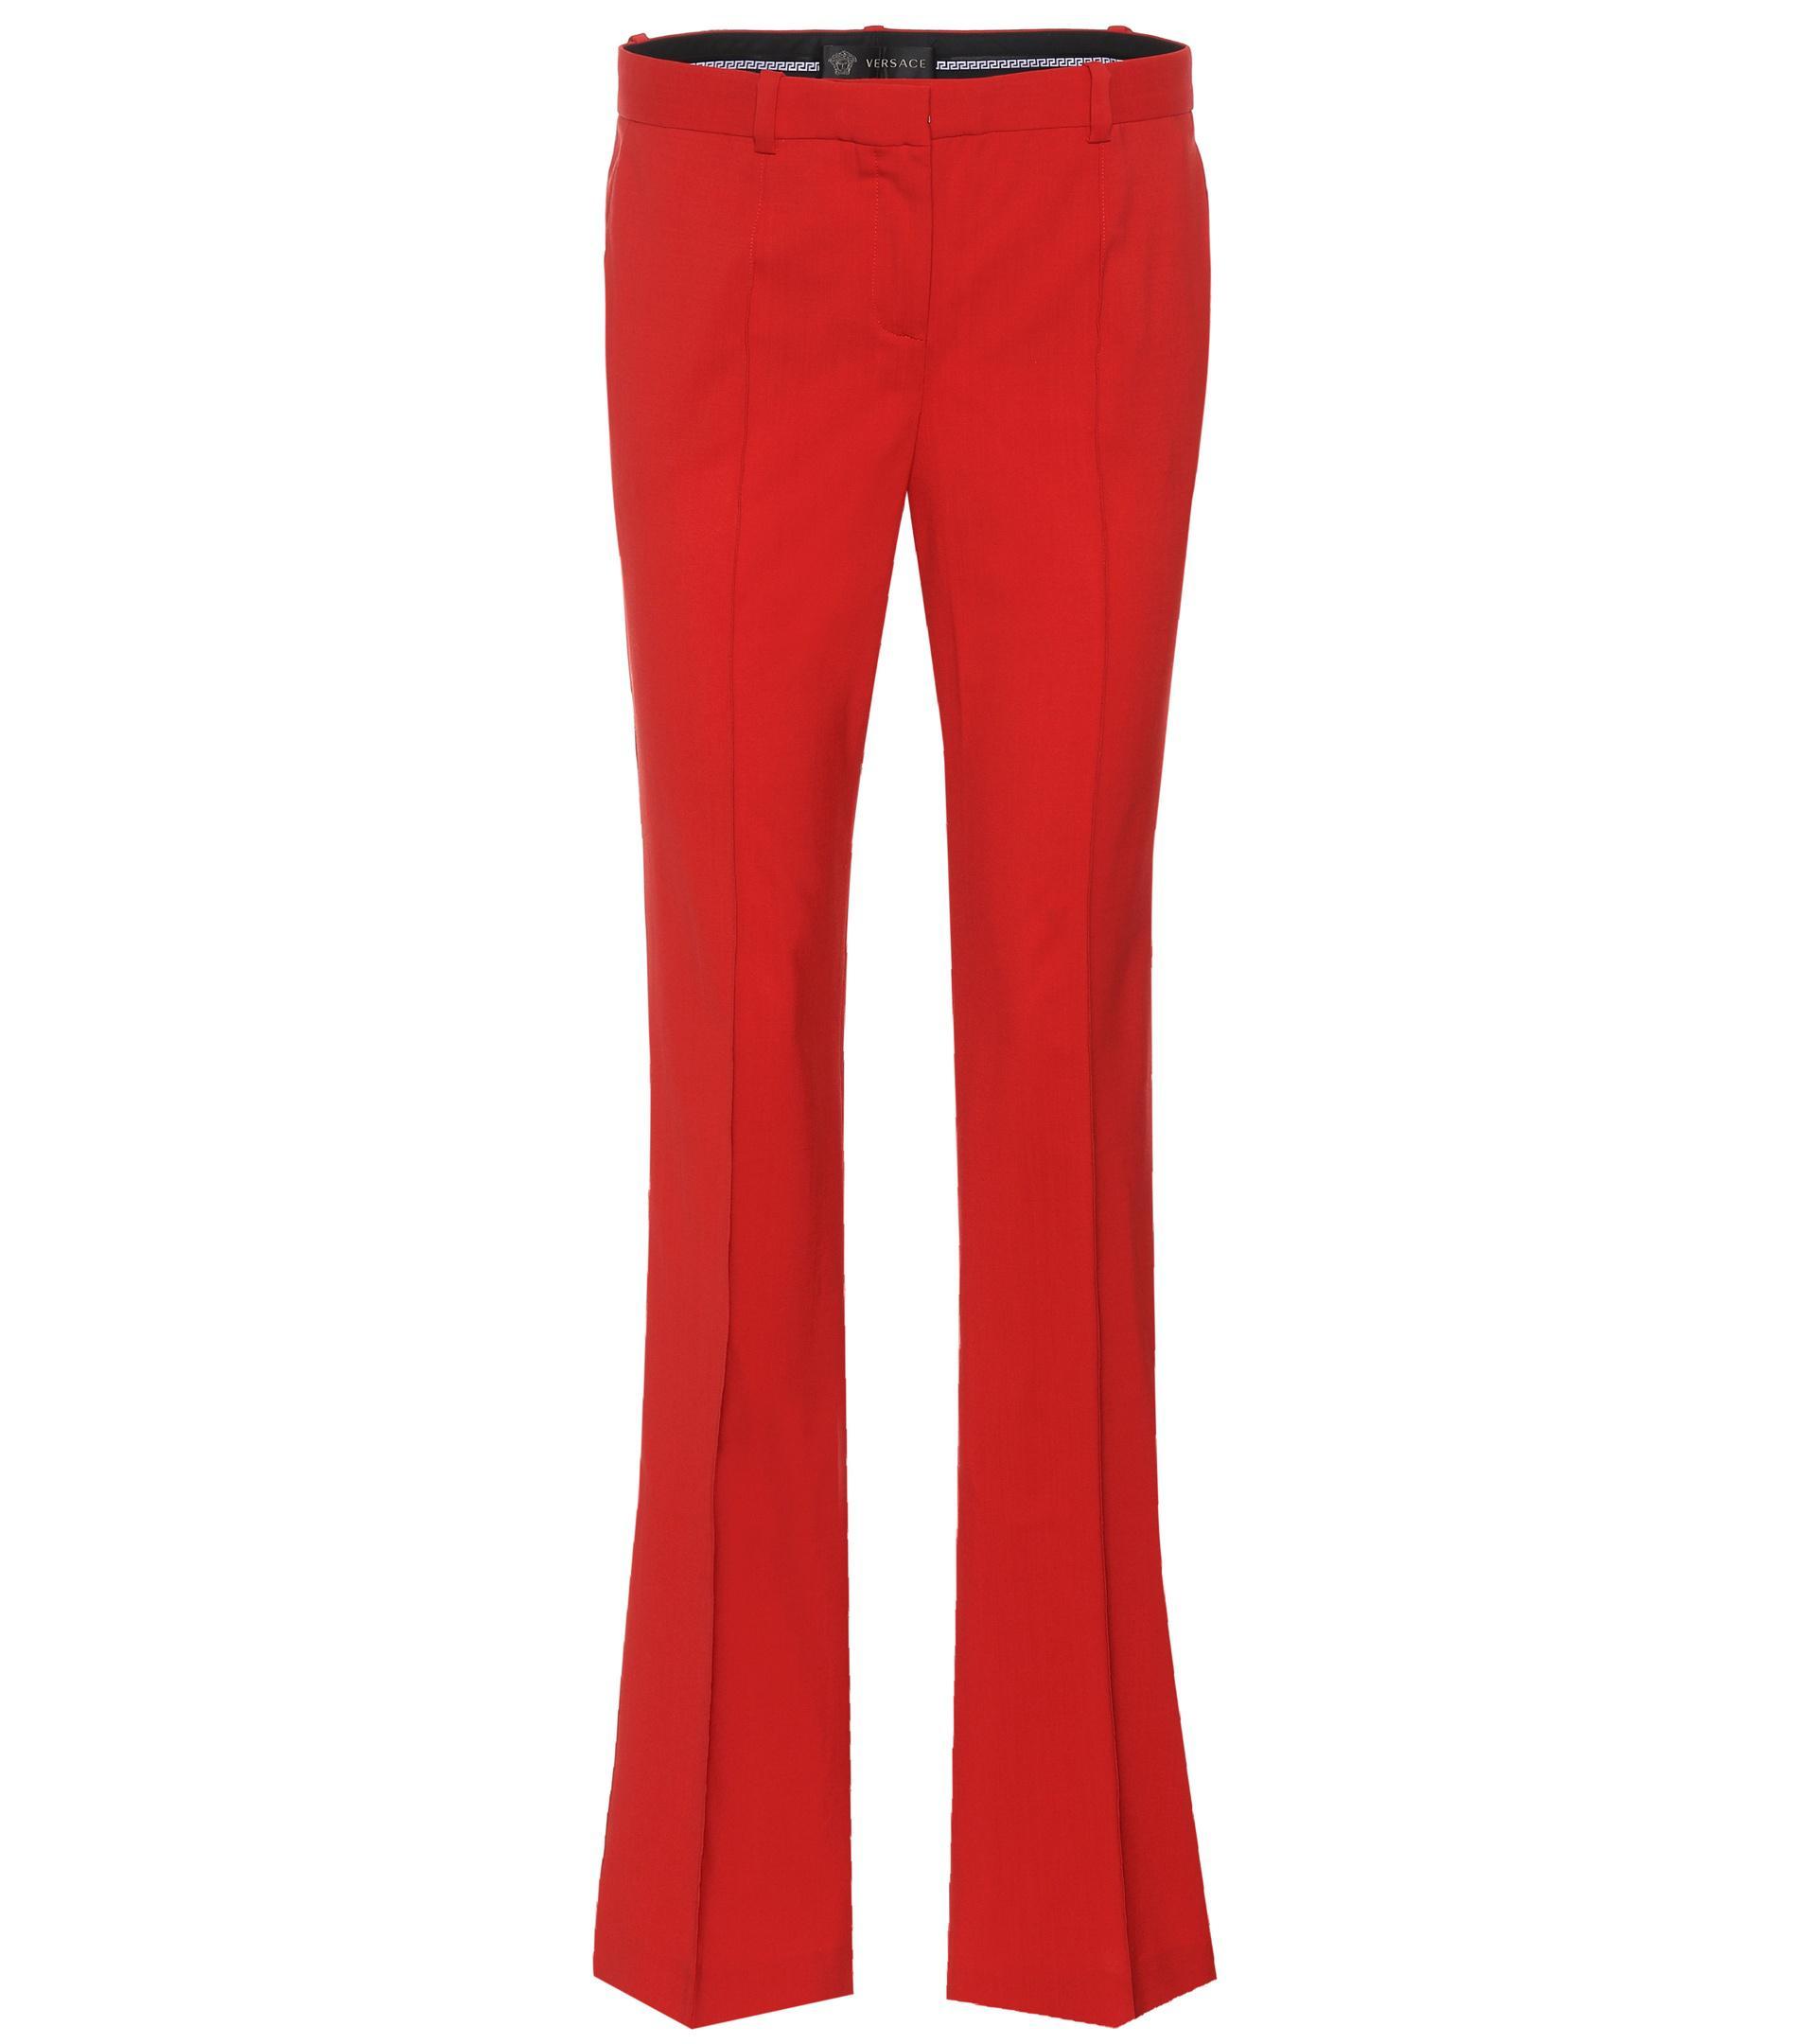 Cheap Sale Outlet Store Shop Your Own Straight-leg trousers Versace Wholesale Price Sale Online 4szqcQuO